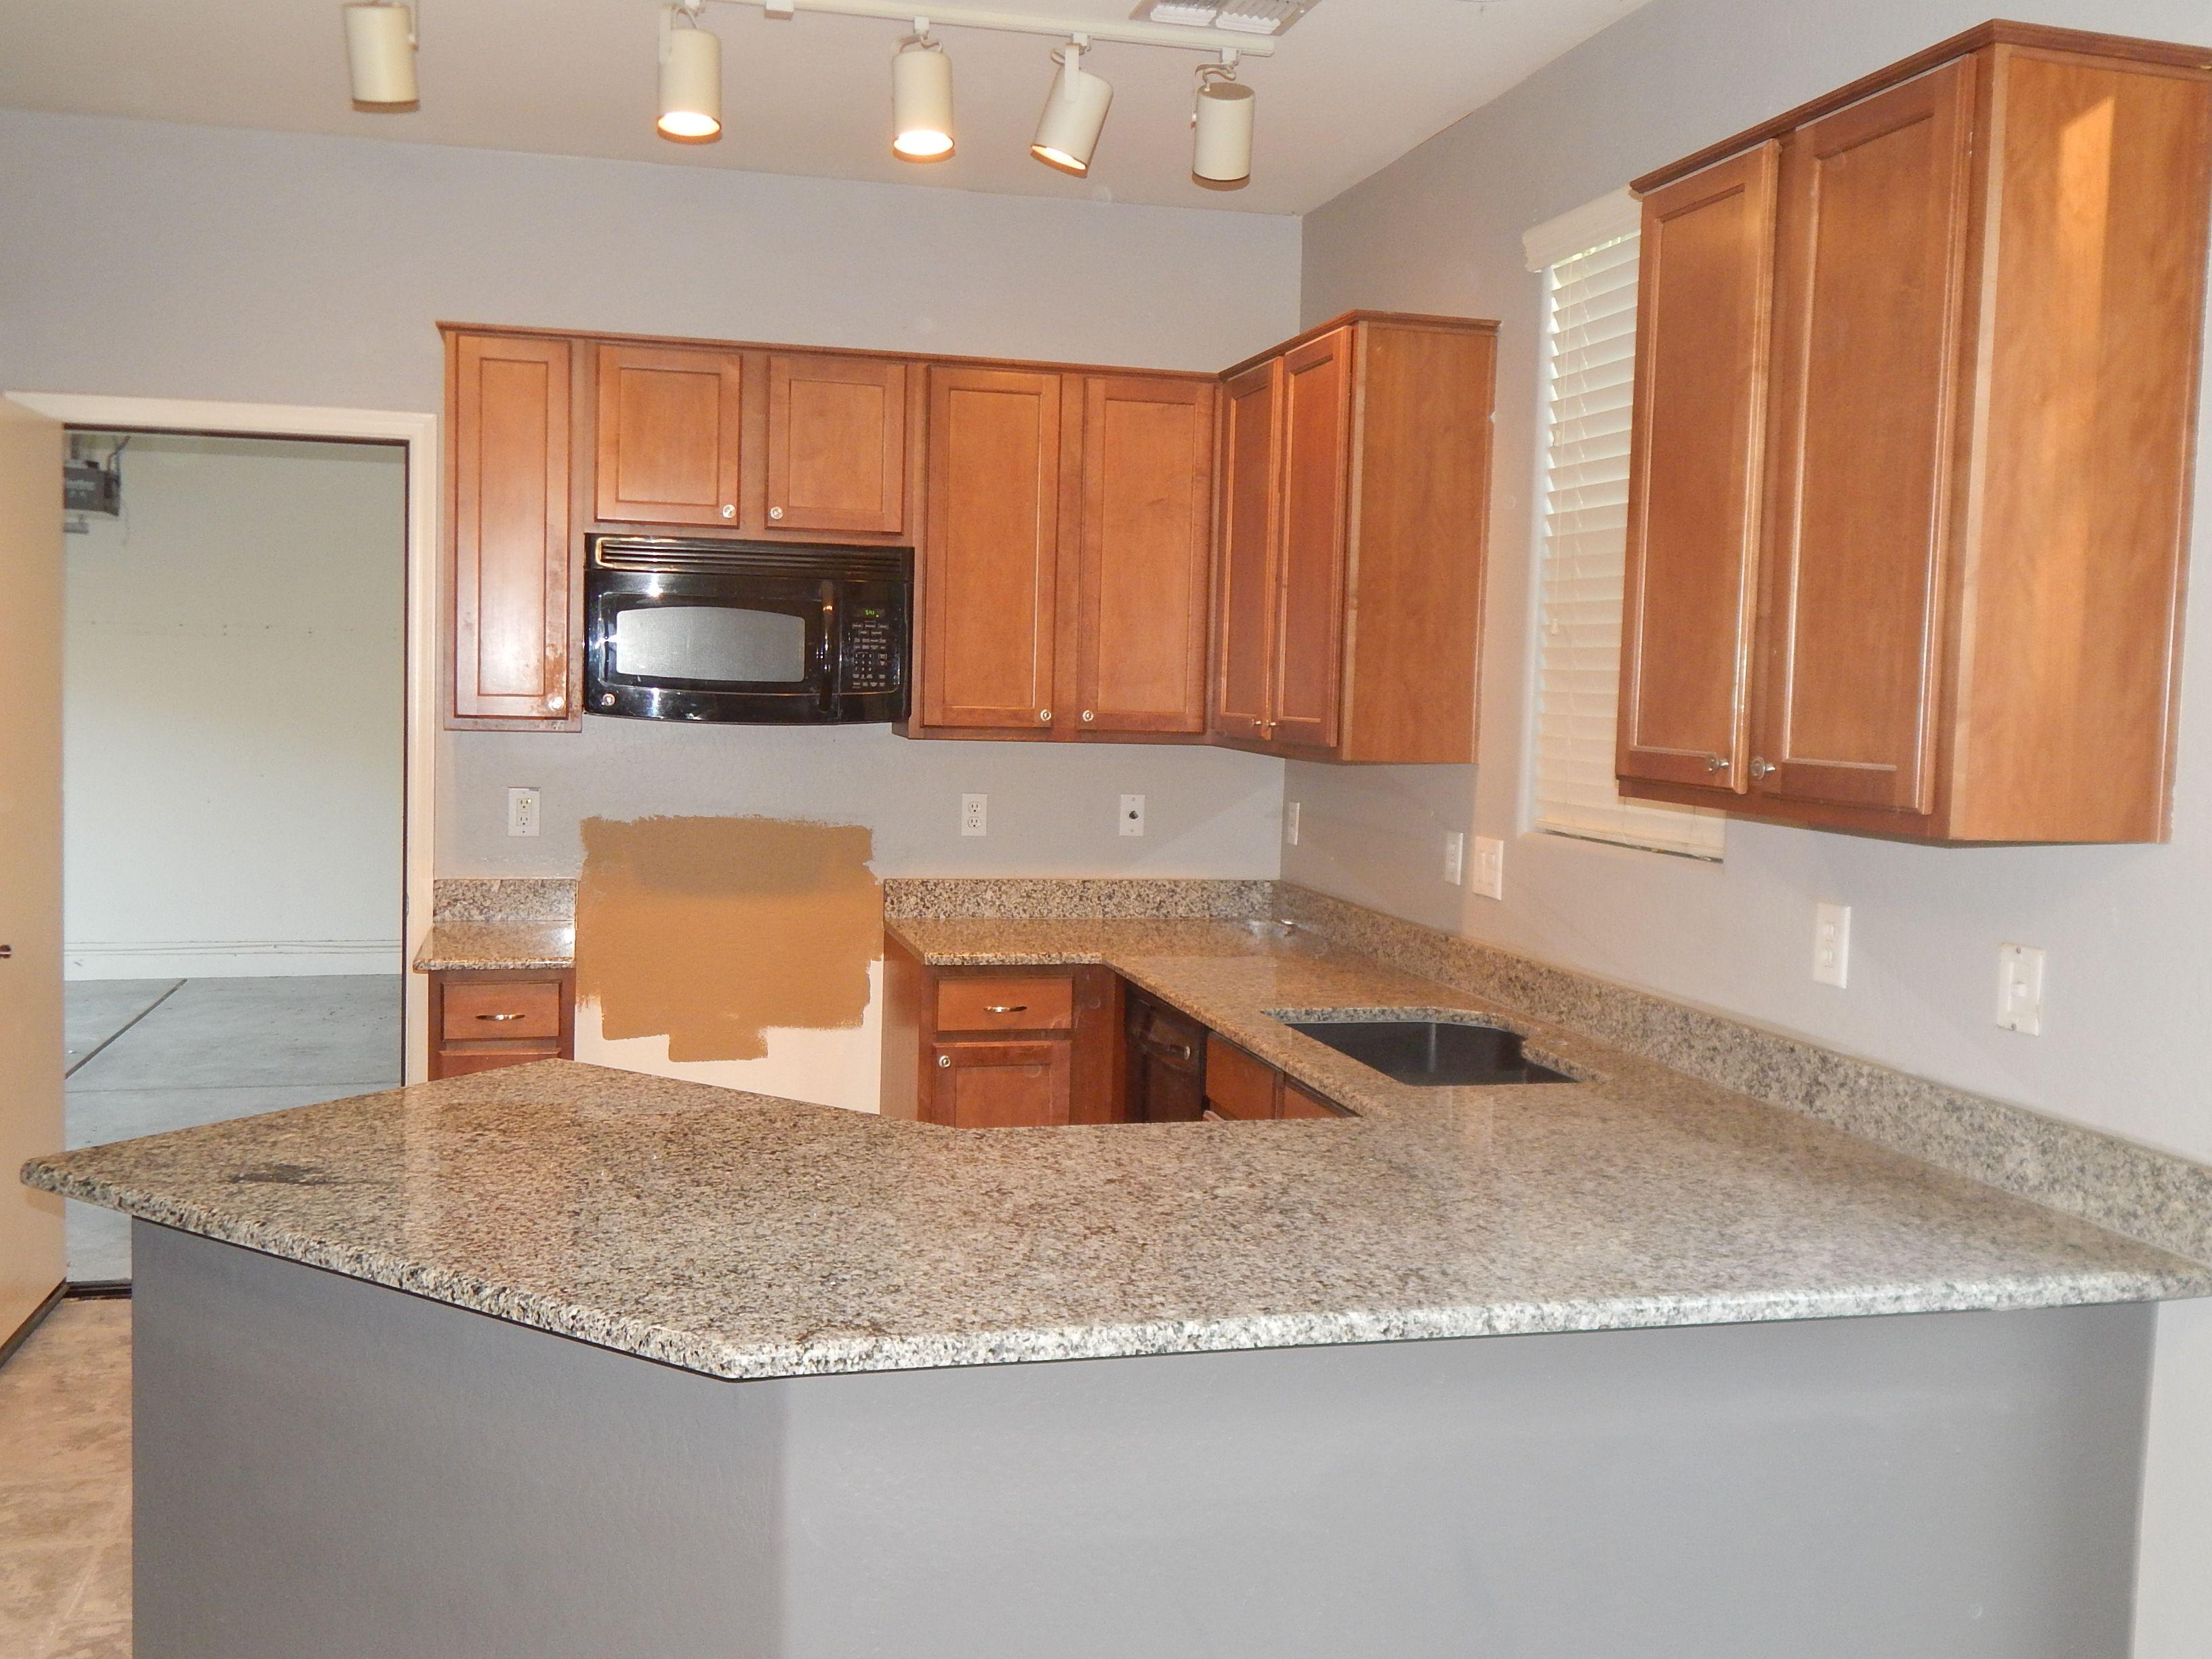 Kitchen remodel with azul platino granite and top radius edge call for a free estimate